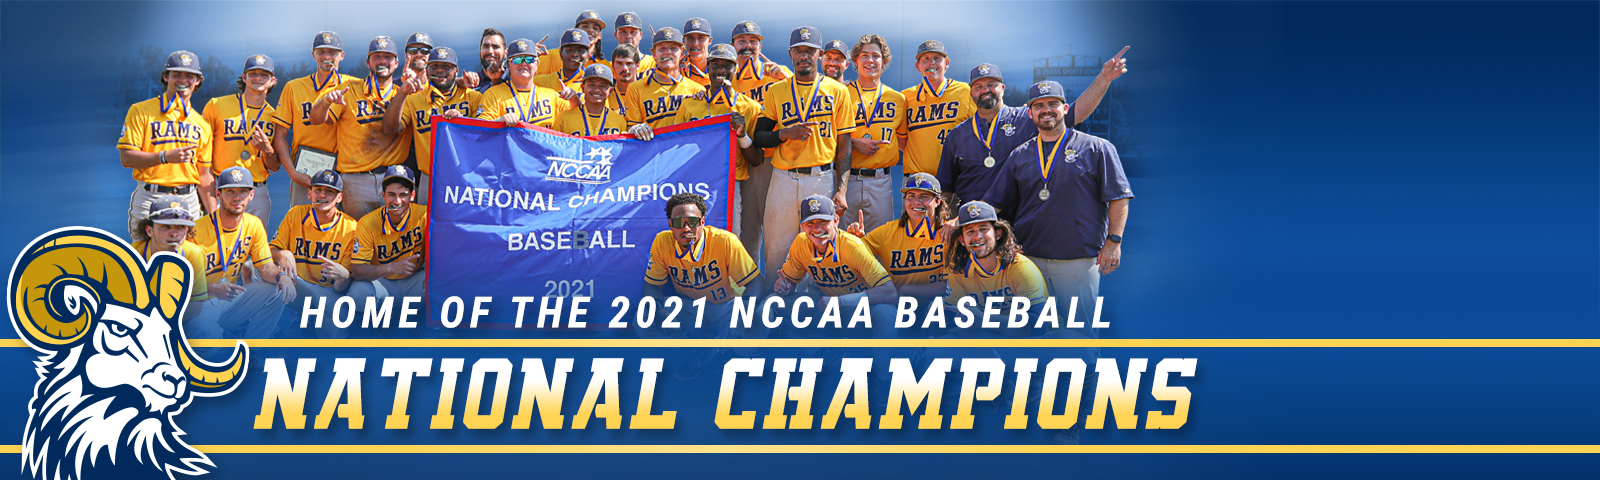 2021 NCCAA Baseball National Champions